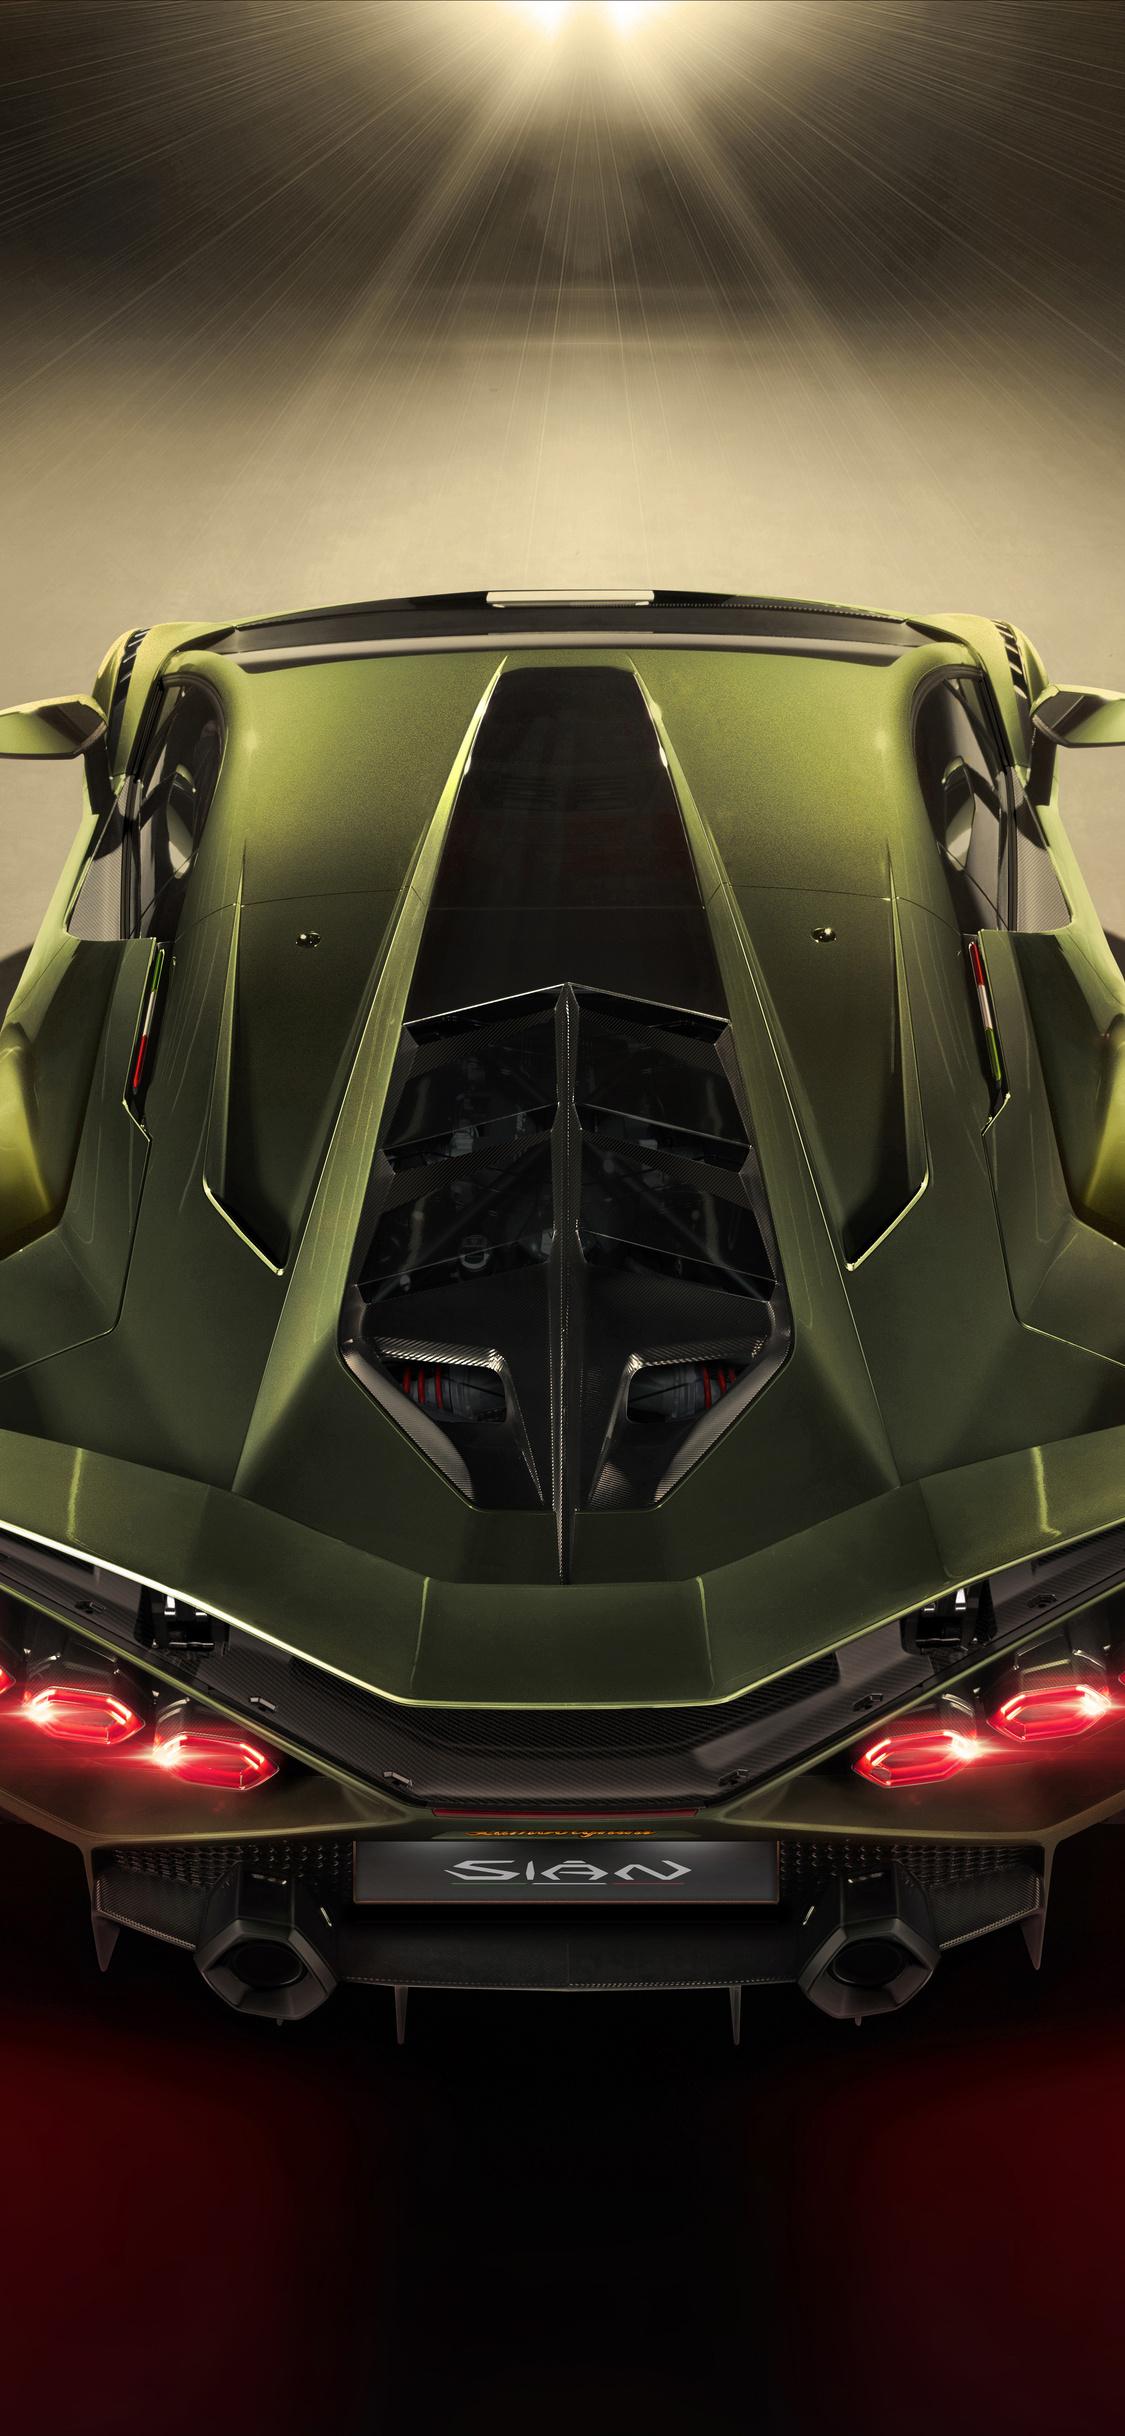 1125x2436 2019 8k Lamborghini Sian Upper View Iphone XS